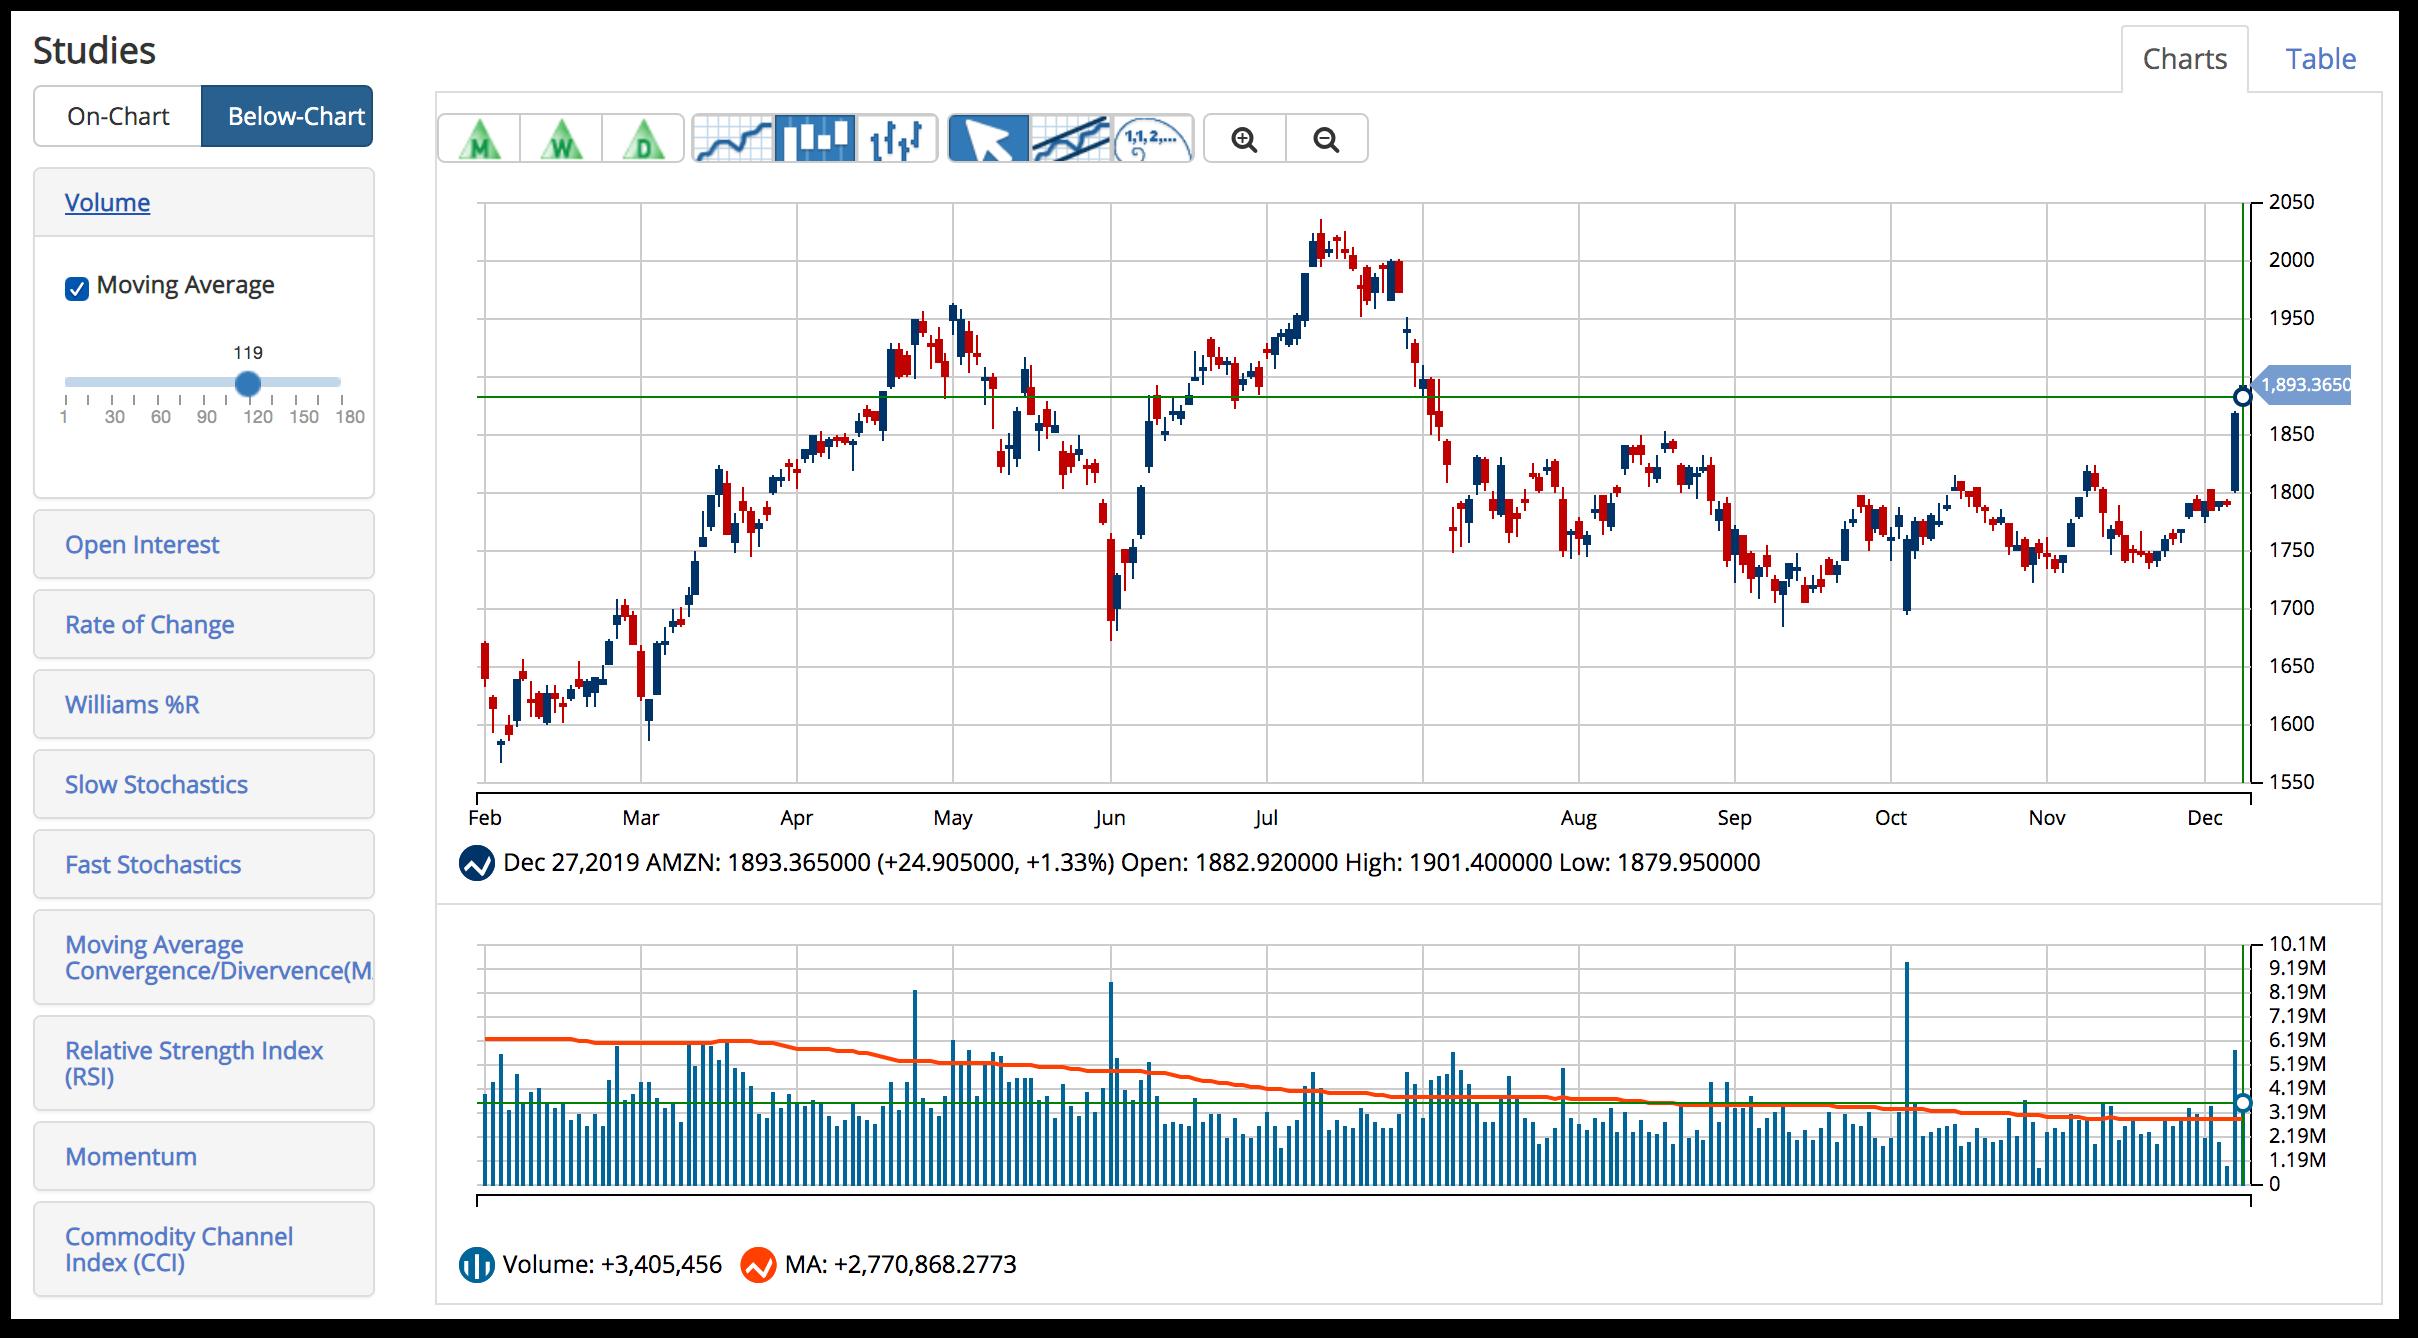 Trading Volume - Technical Analysis